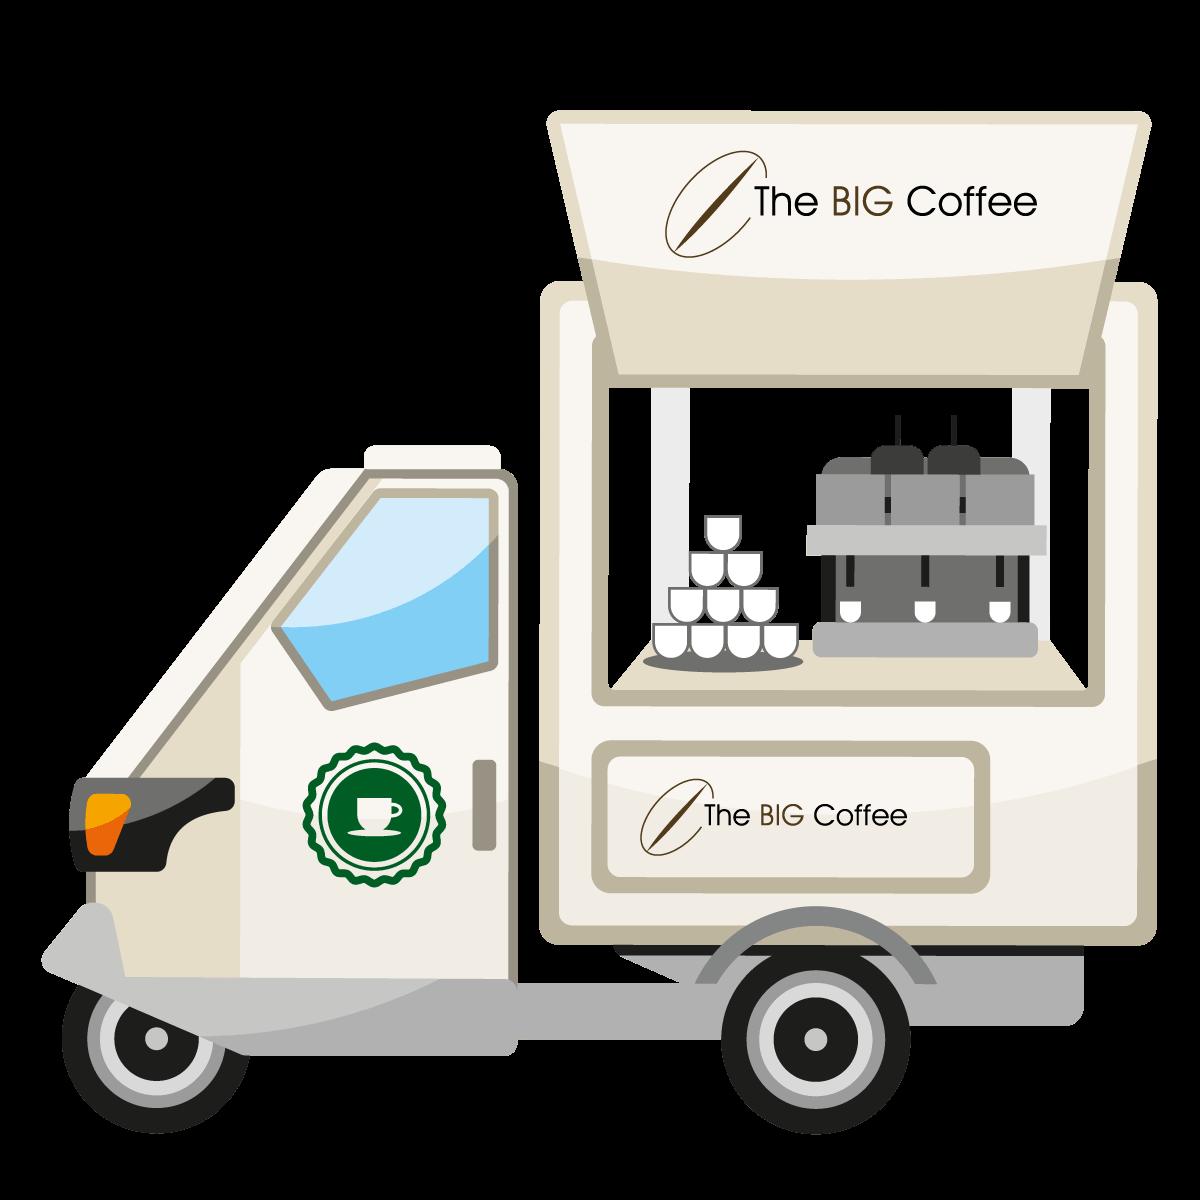 Coffee Van Conversions Since 2006